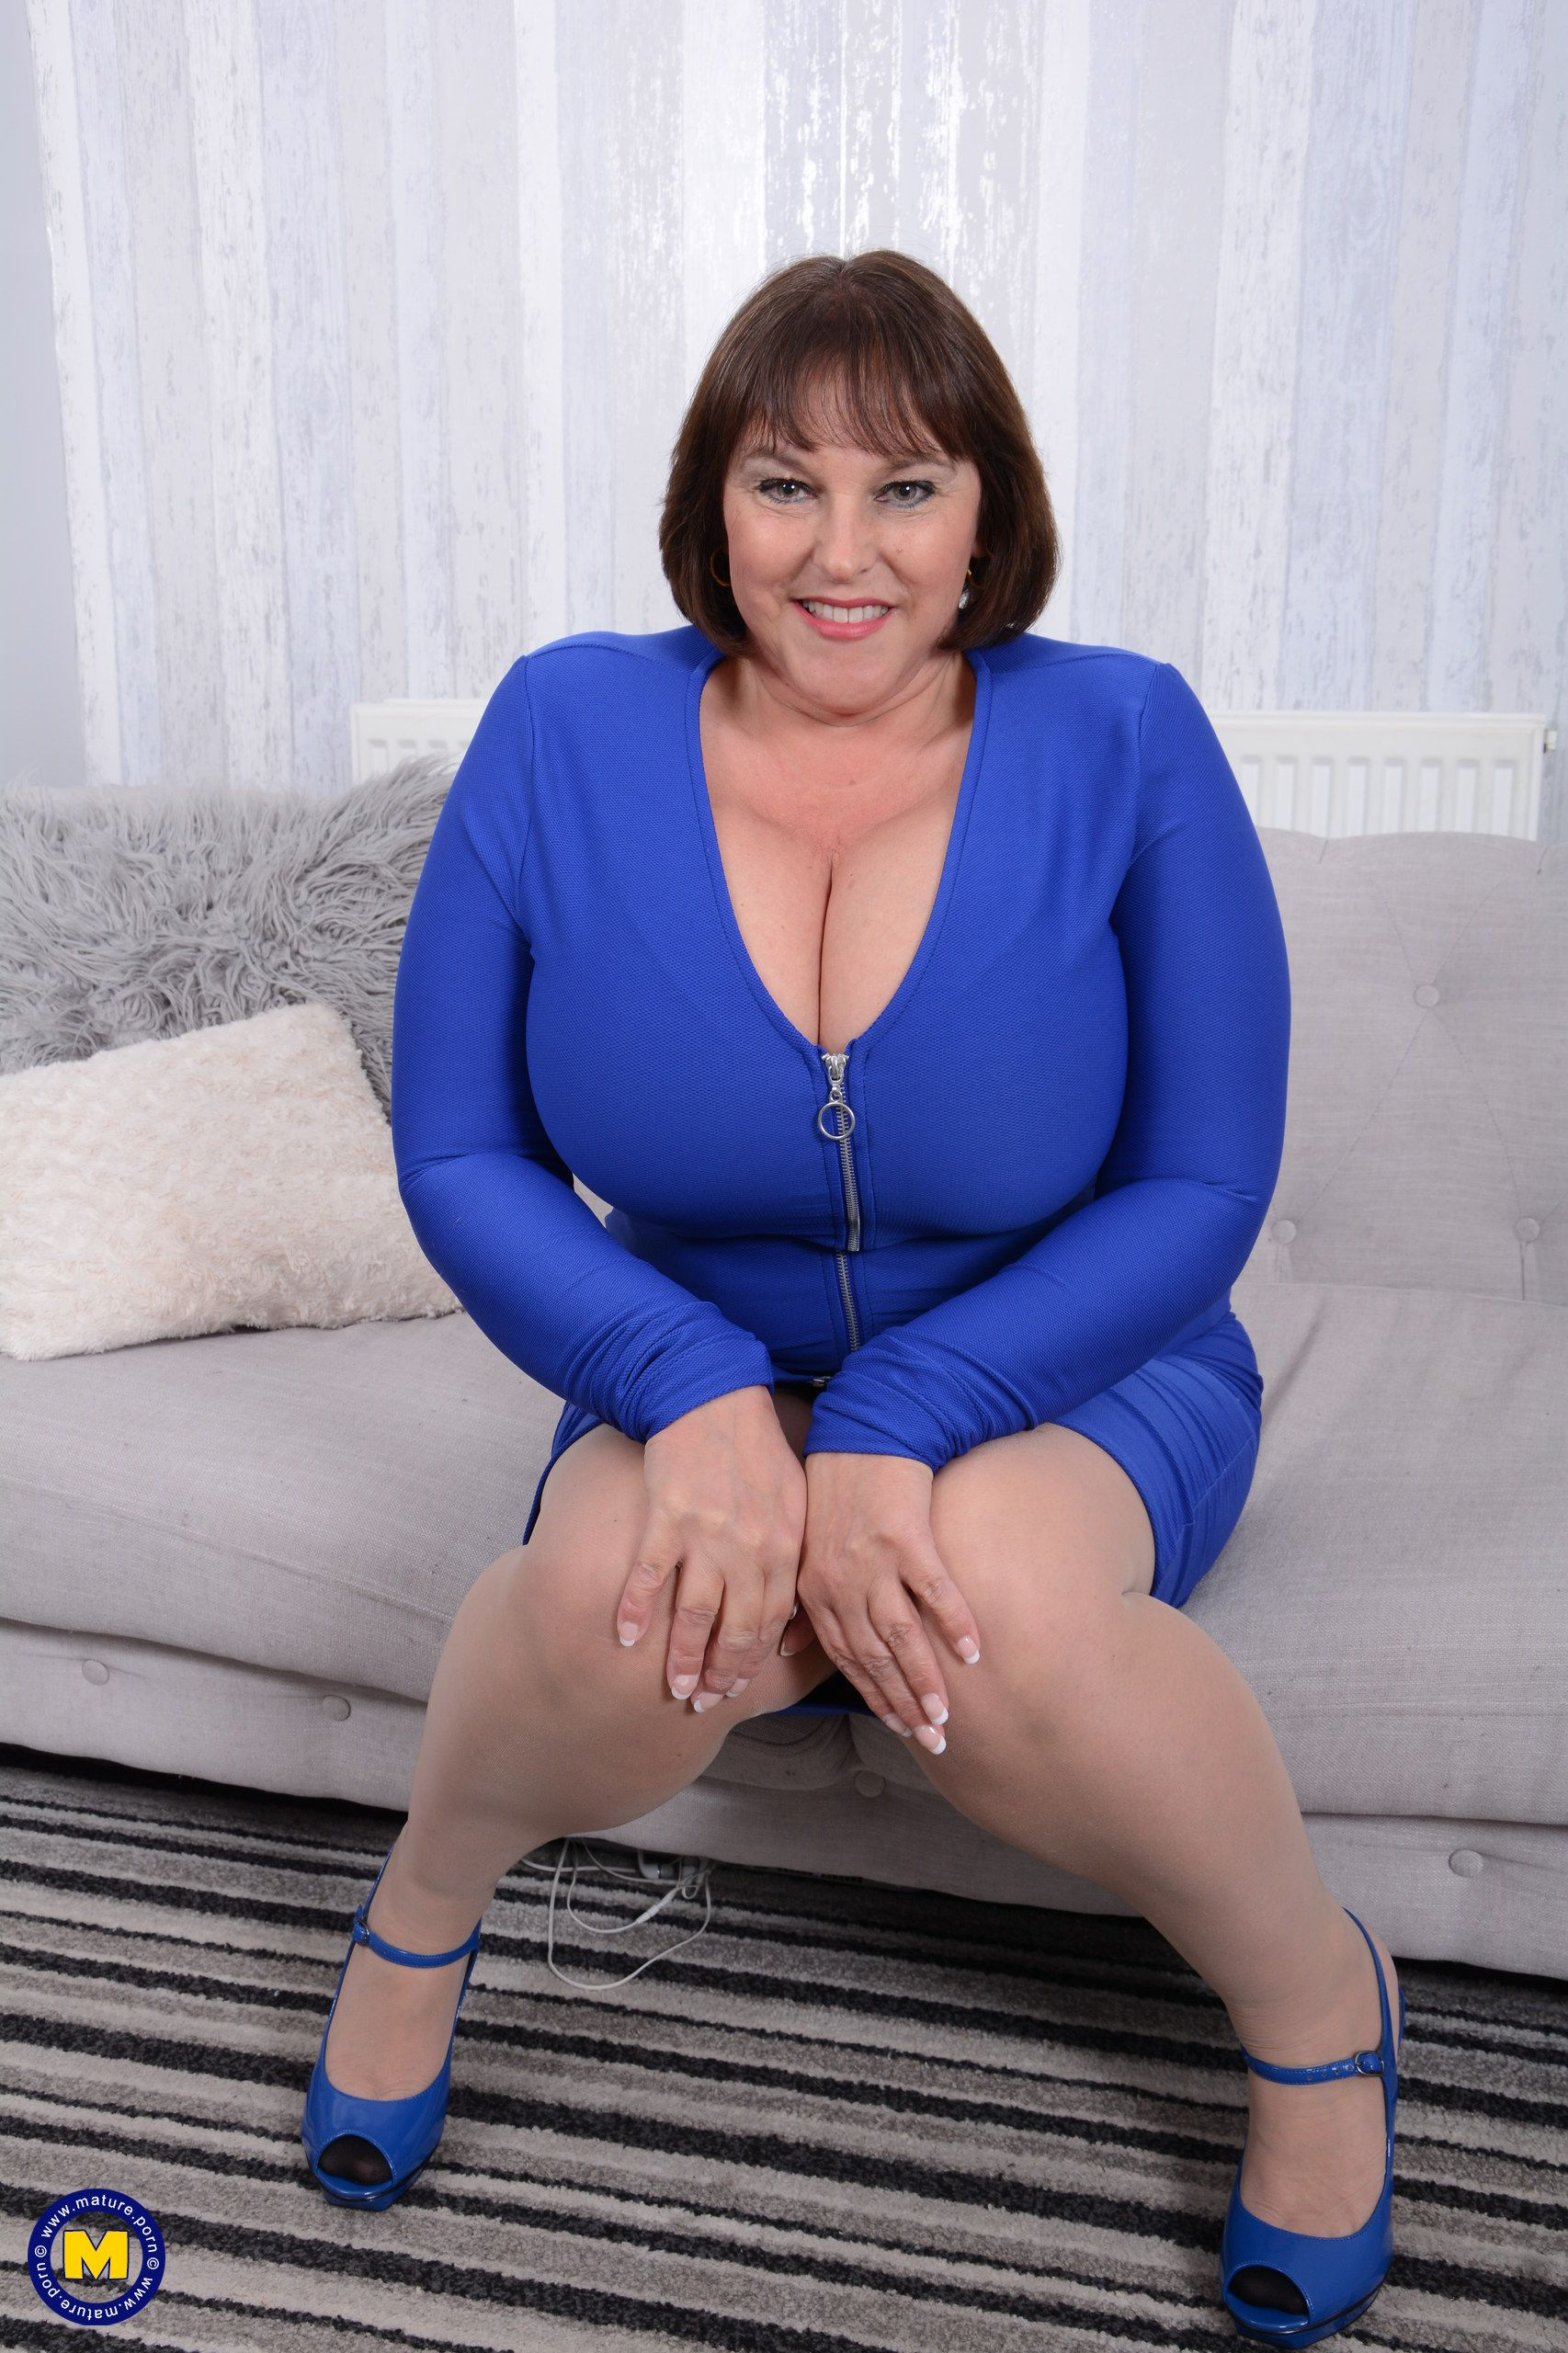 Carol Brown Eu 50 British Huge Breasted Housewife Carol Brown Fingering Herself Mature Nl